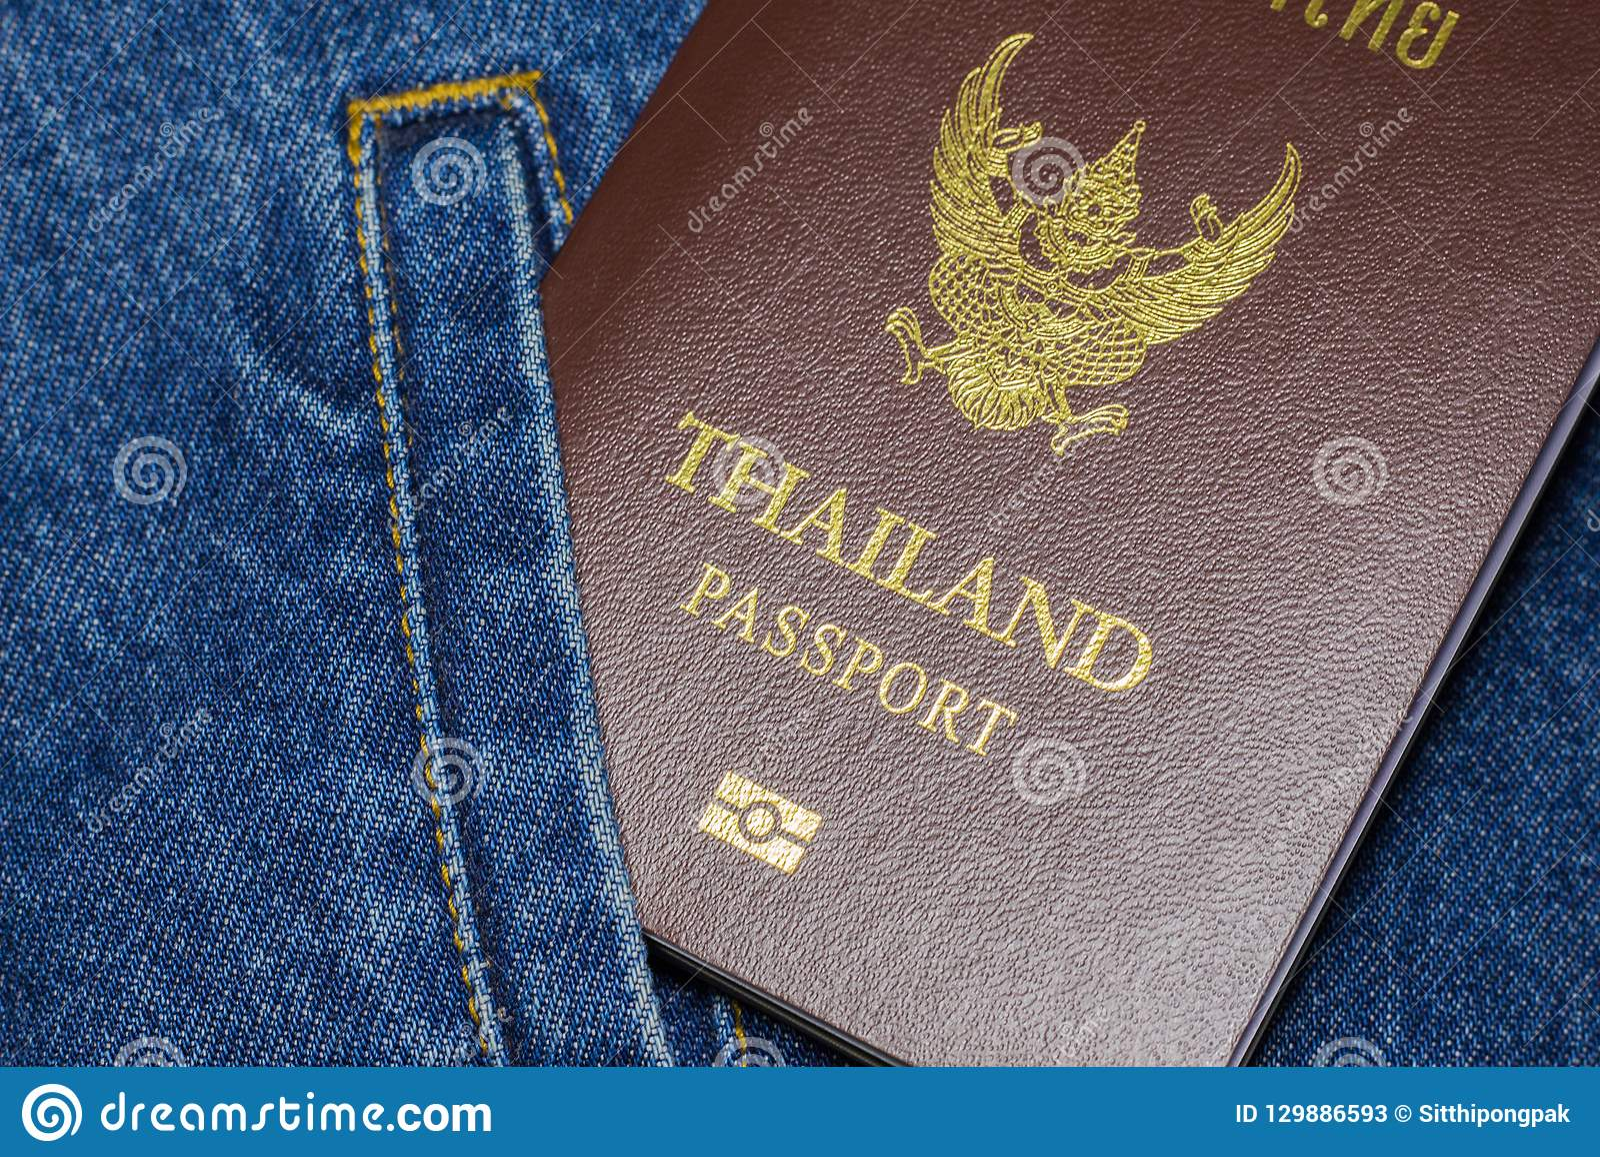 Passaporto sui jeans